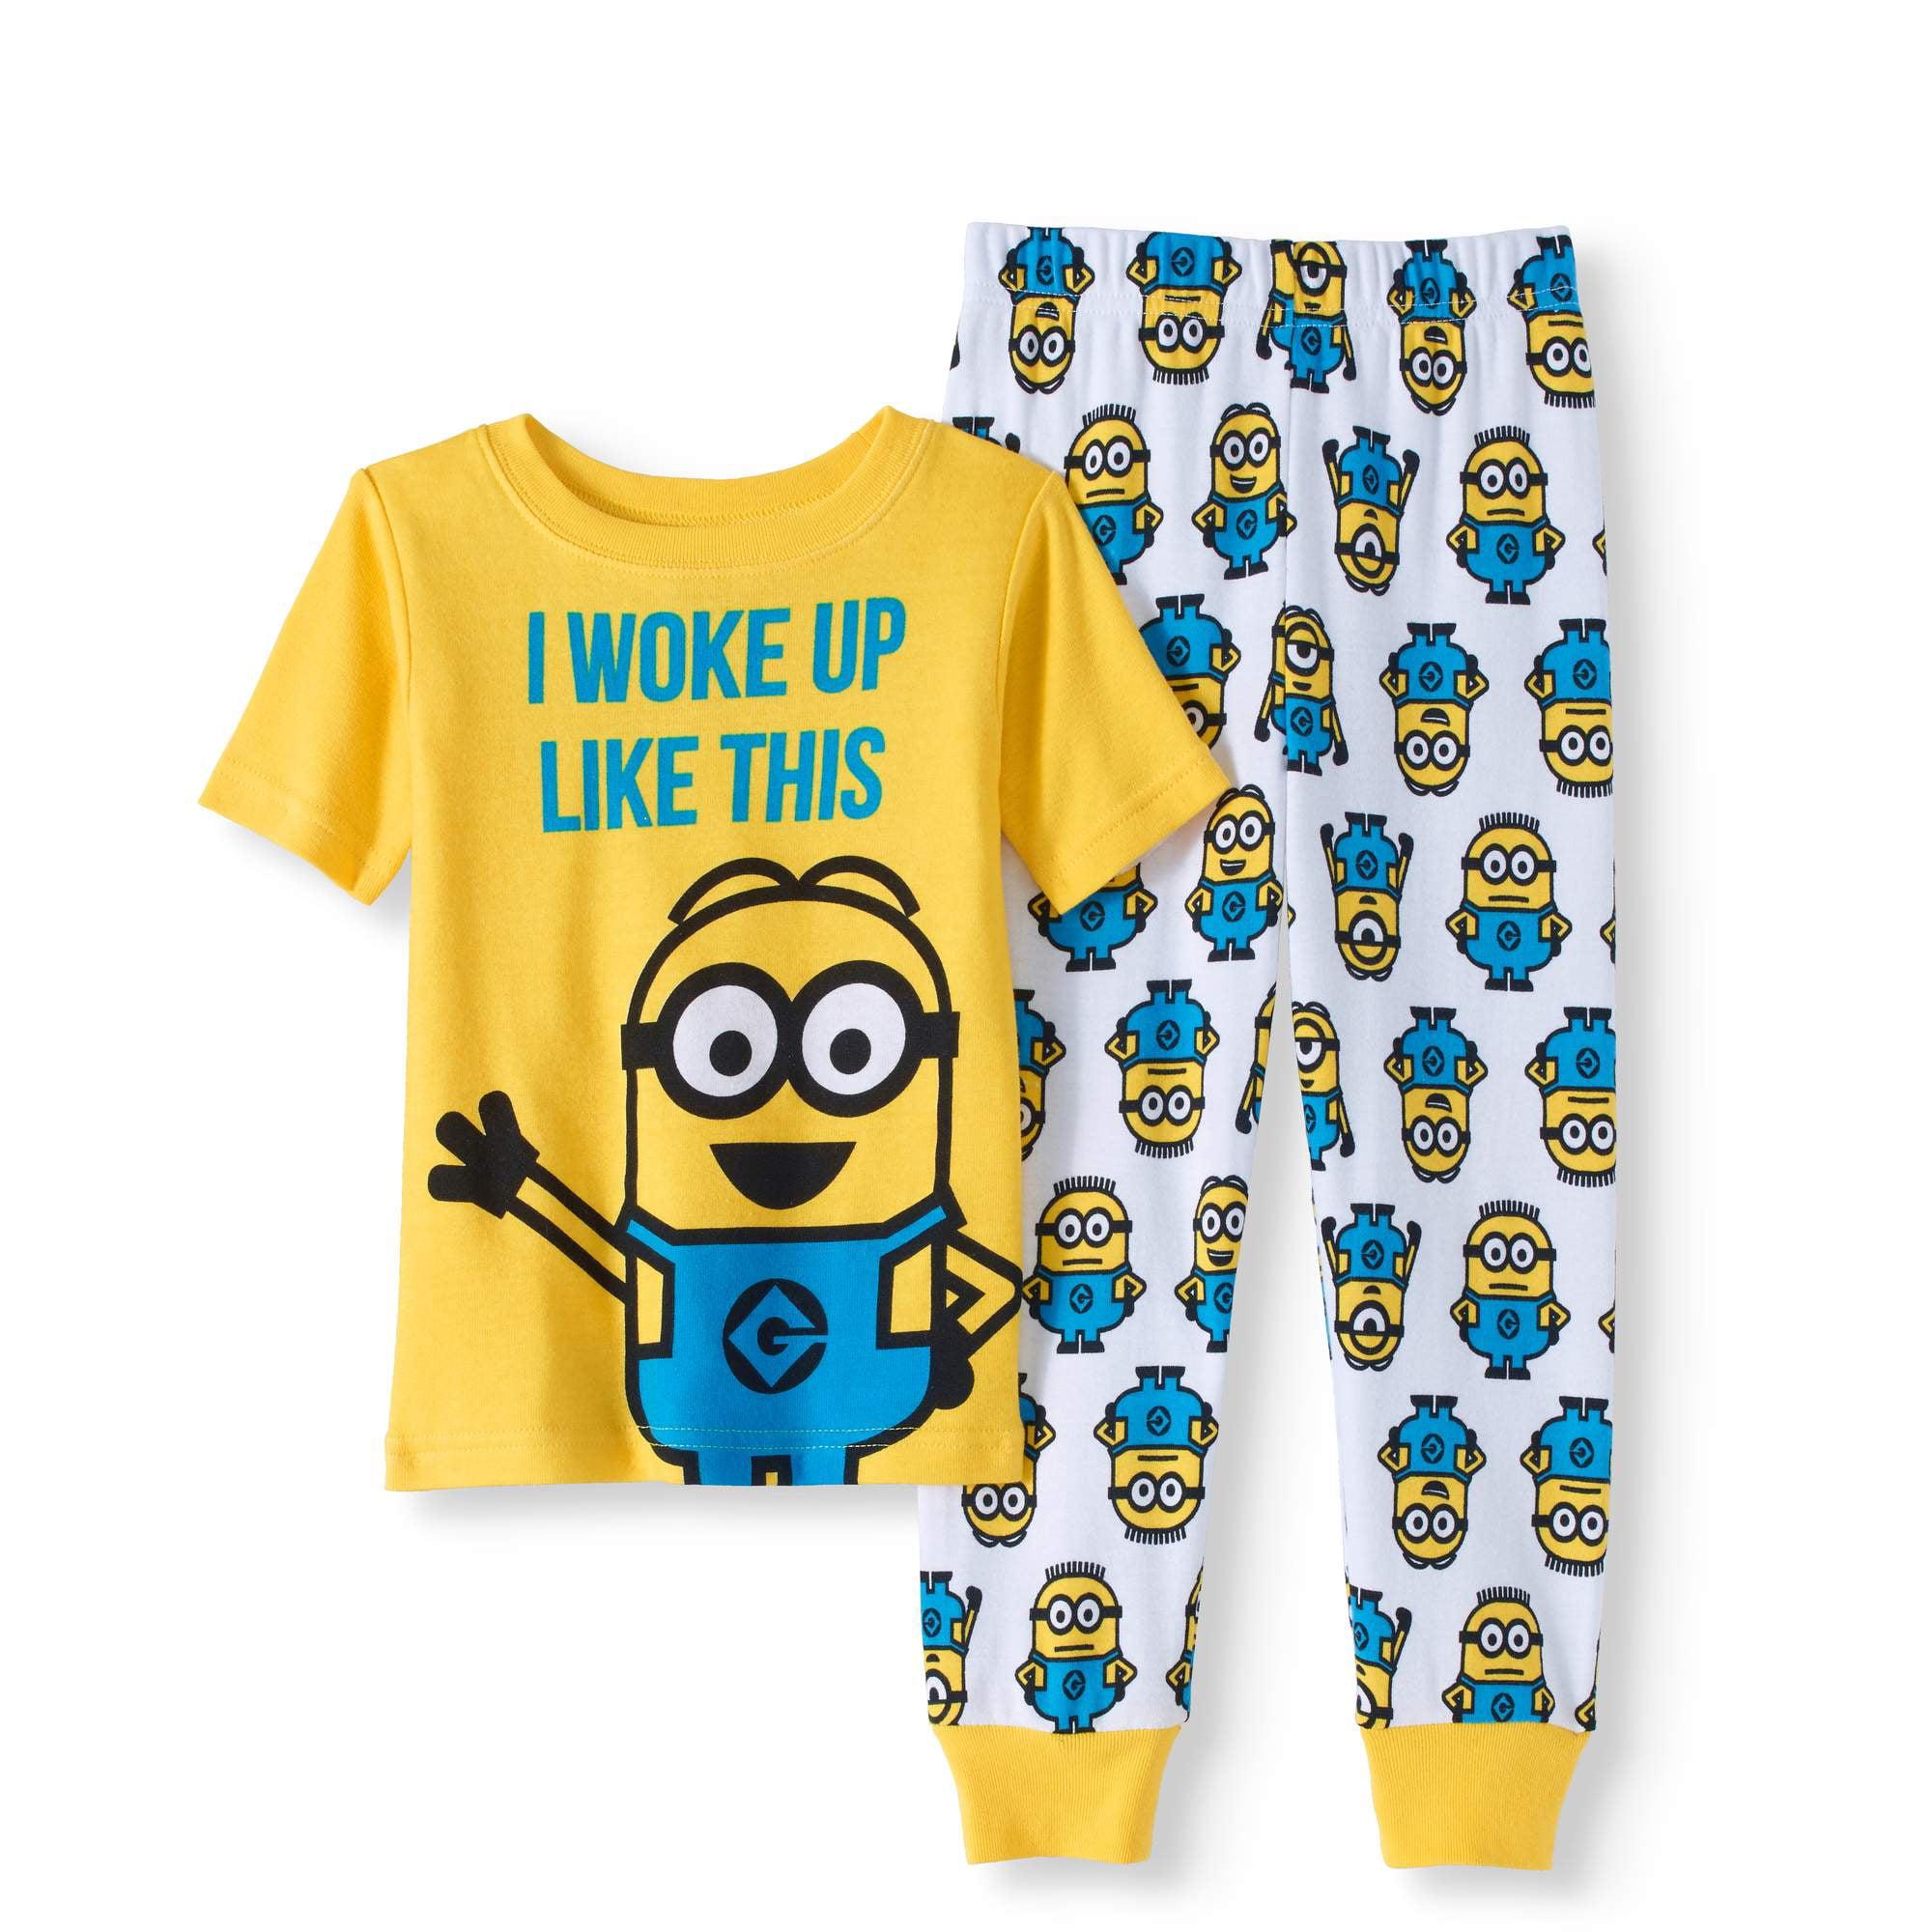 Minions Toddler Boy Cotton Tight Fit Pajamas, 2pc Set